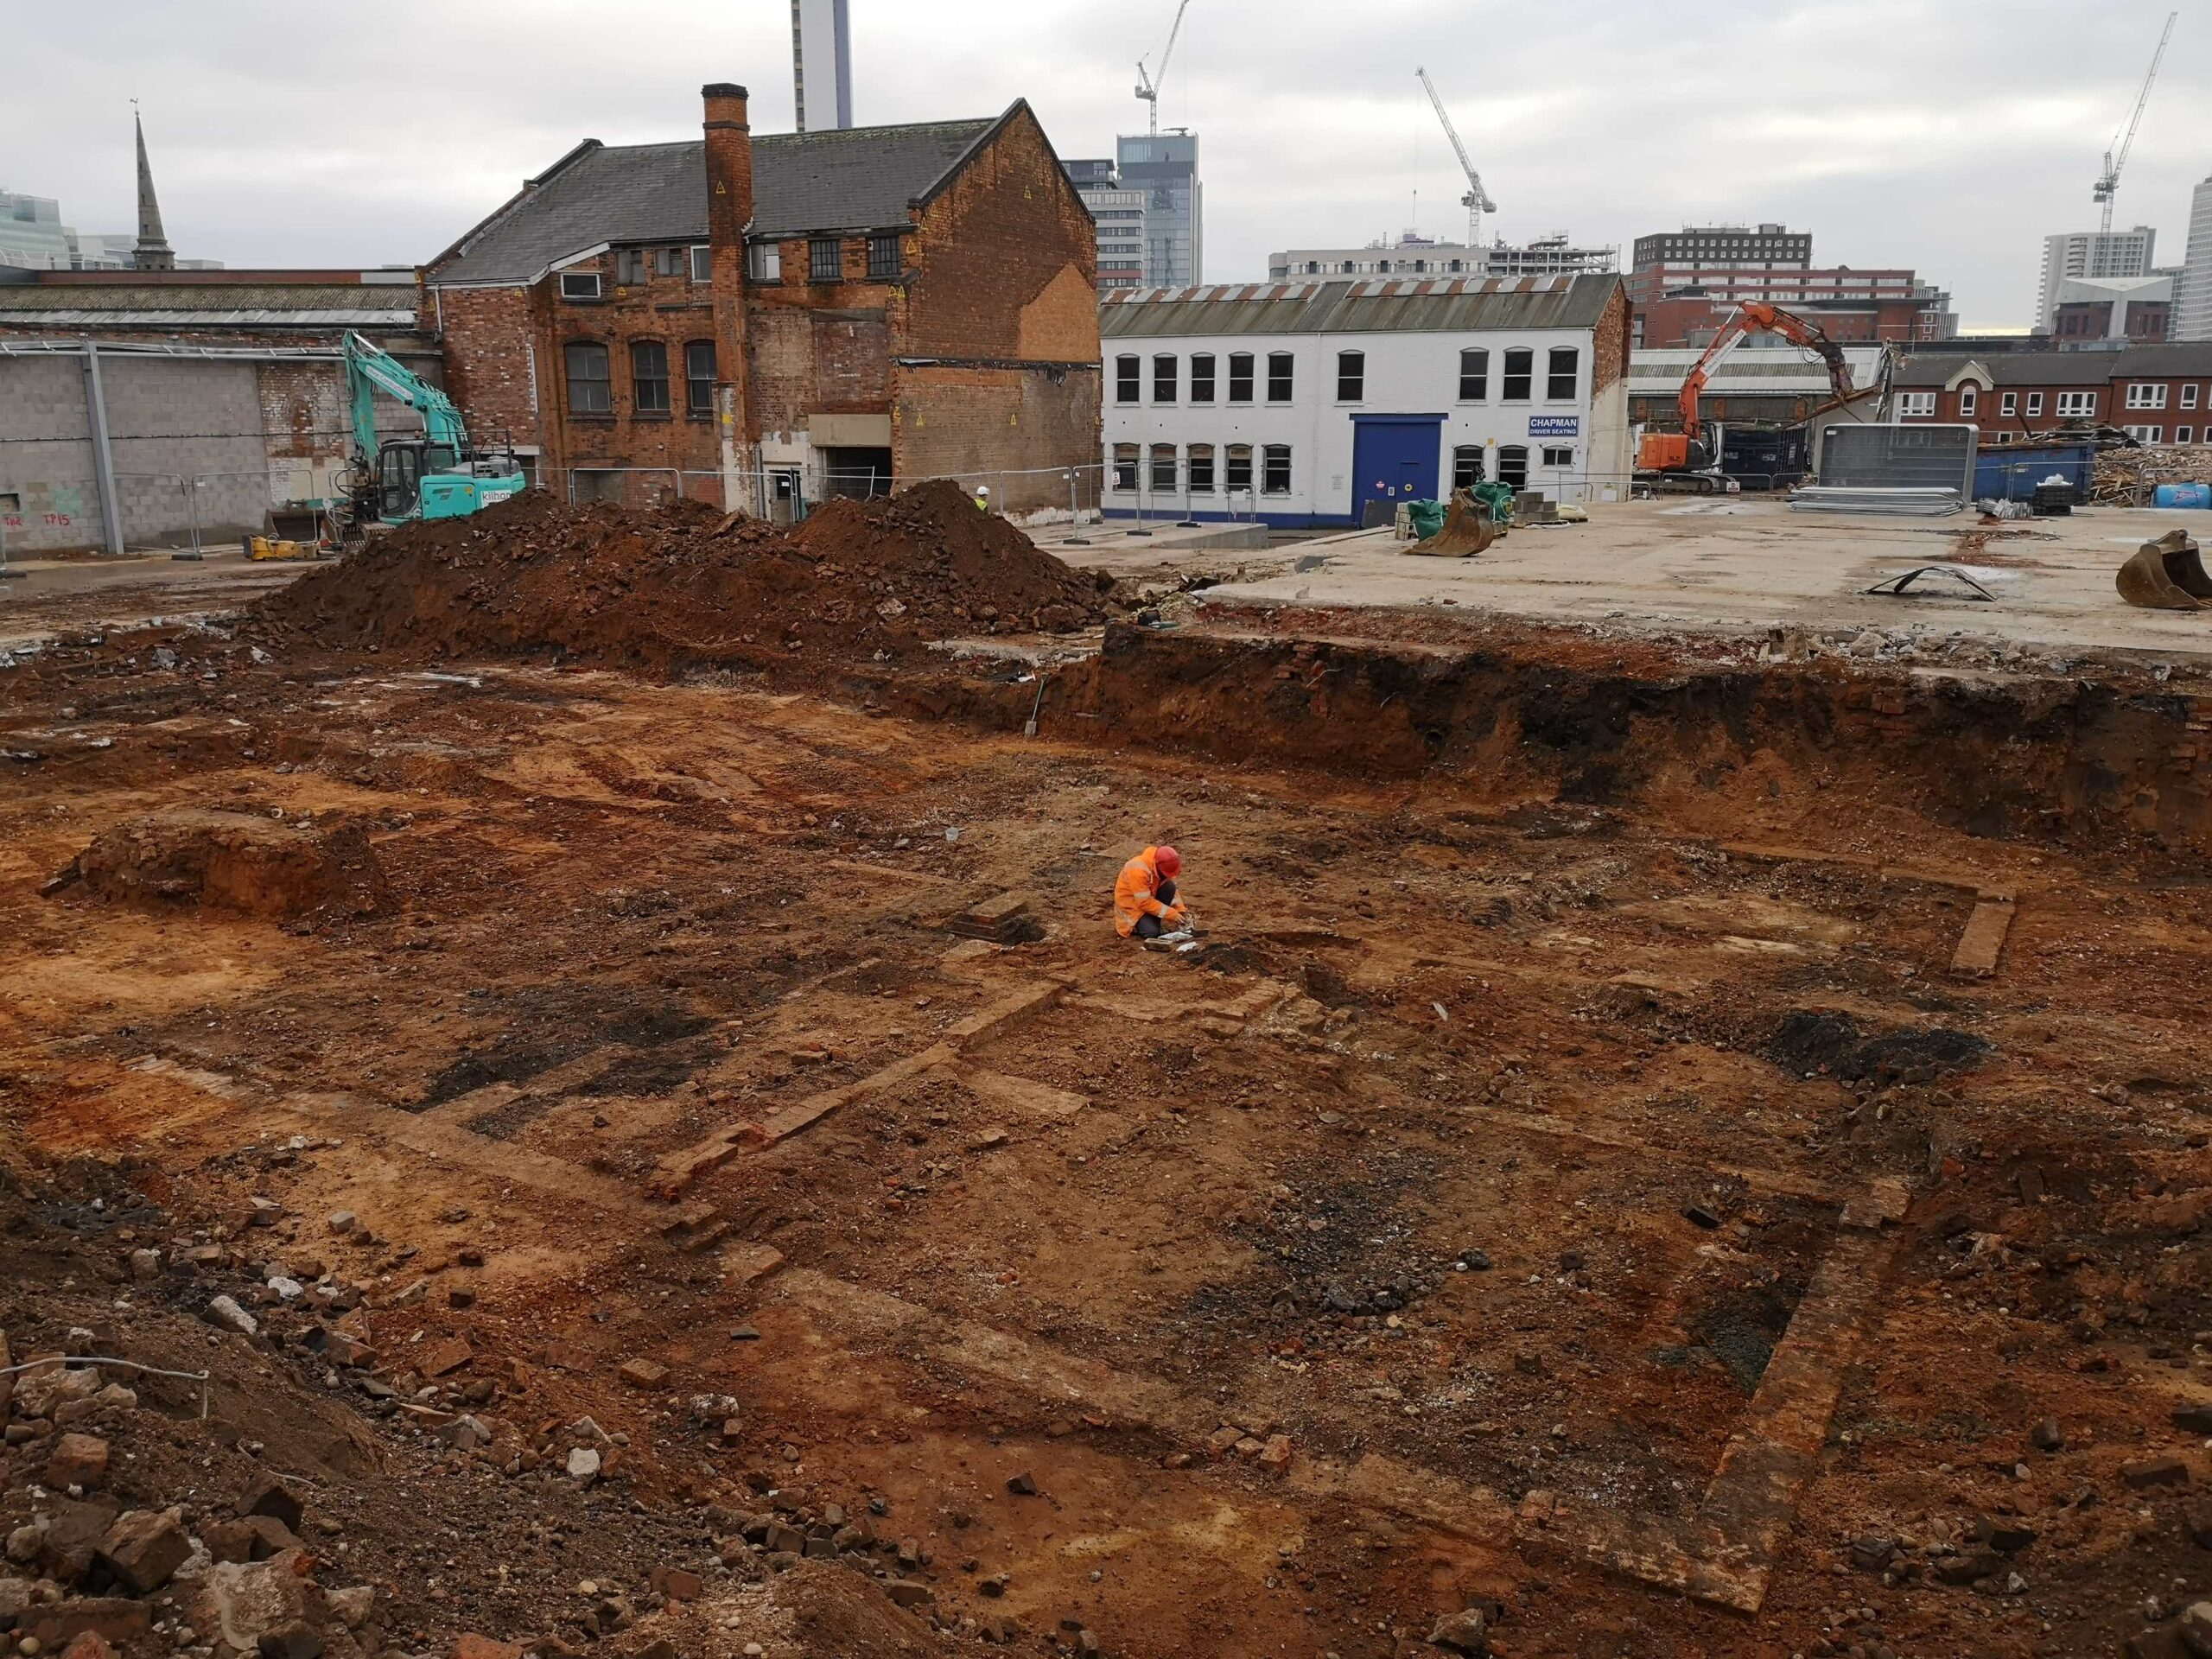 'James Watt Villa Footprint 1': Archaeologists on site at St Paul's Quarter in the Jewellery Quarter. (Photo credit: RPS)